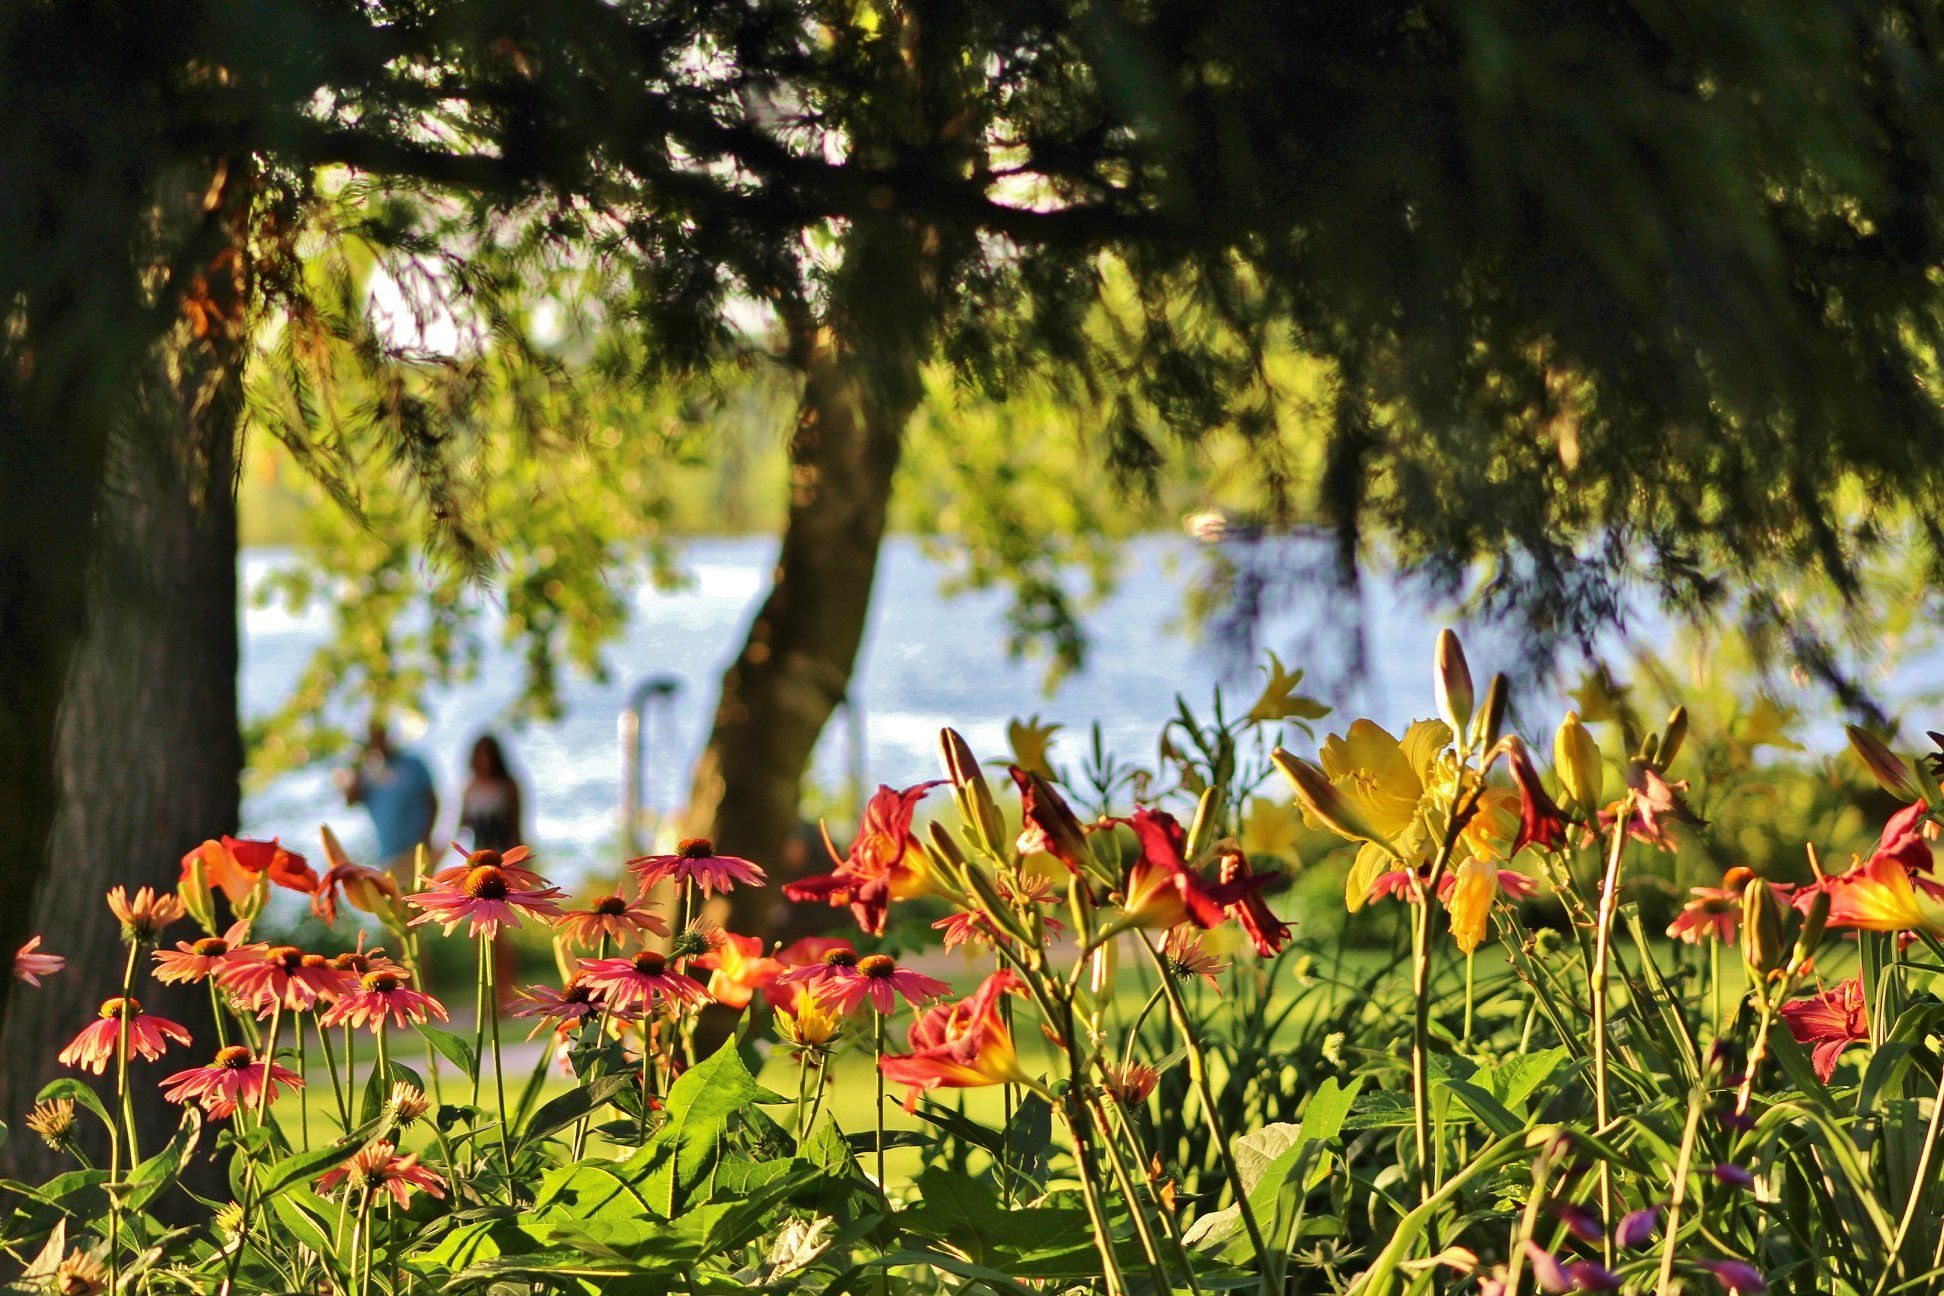 c688ce8ff31d93ed1965b8feabe85db4 - Munsinger Gardens In St Cloud Minnesota